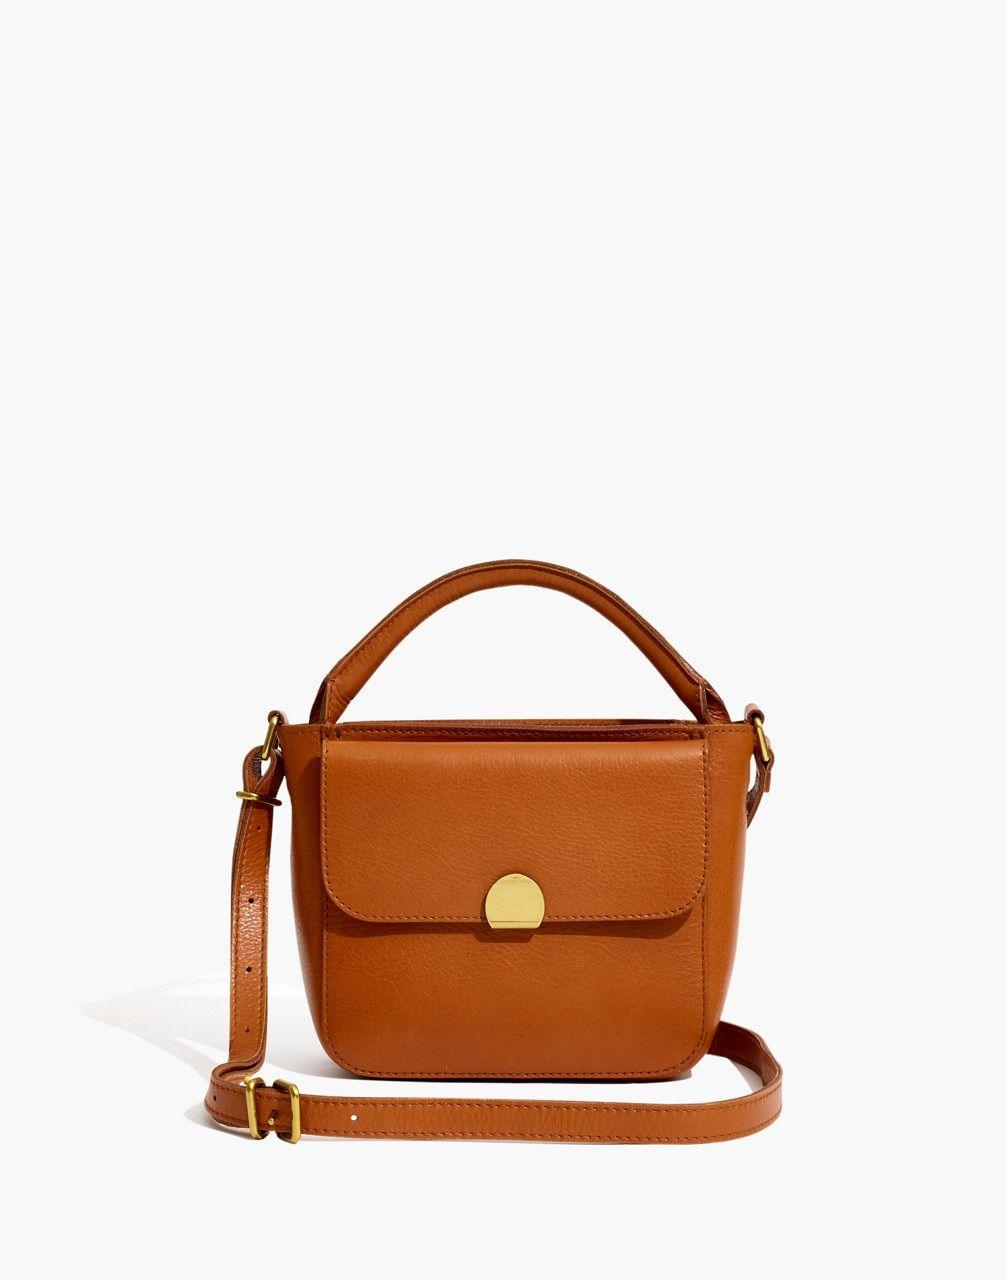 Marc Jacobs | Mini Rider Leather Crossbody Bag | Nordstrom